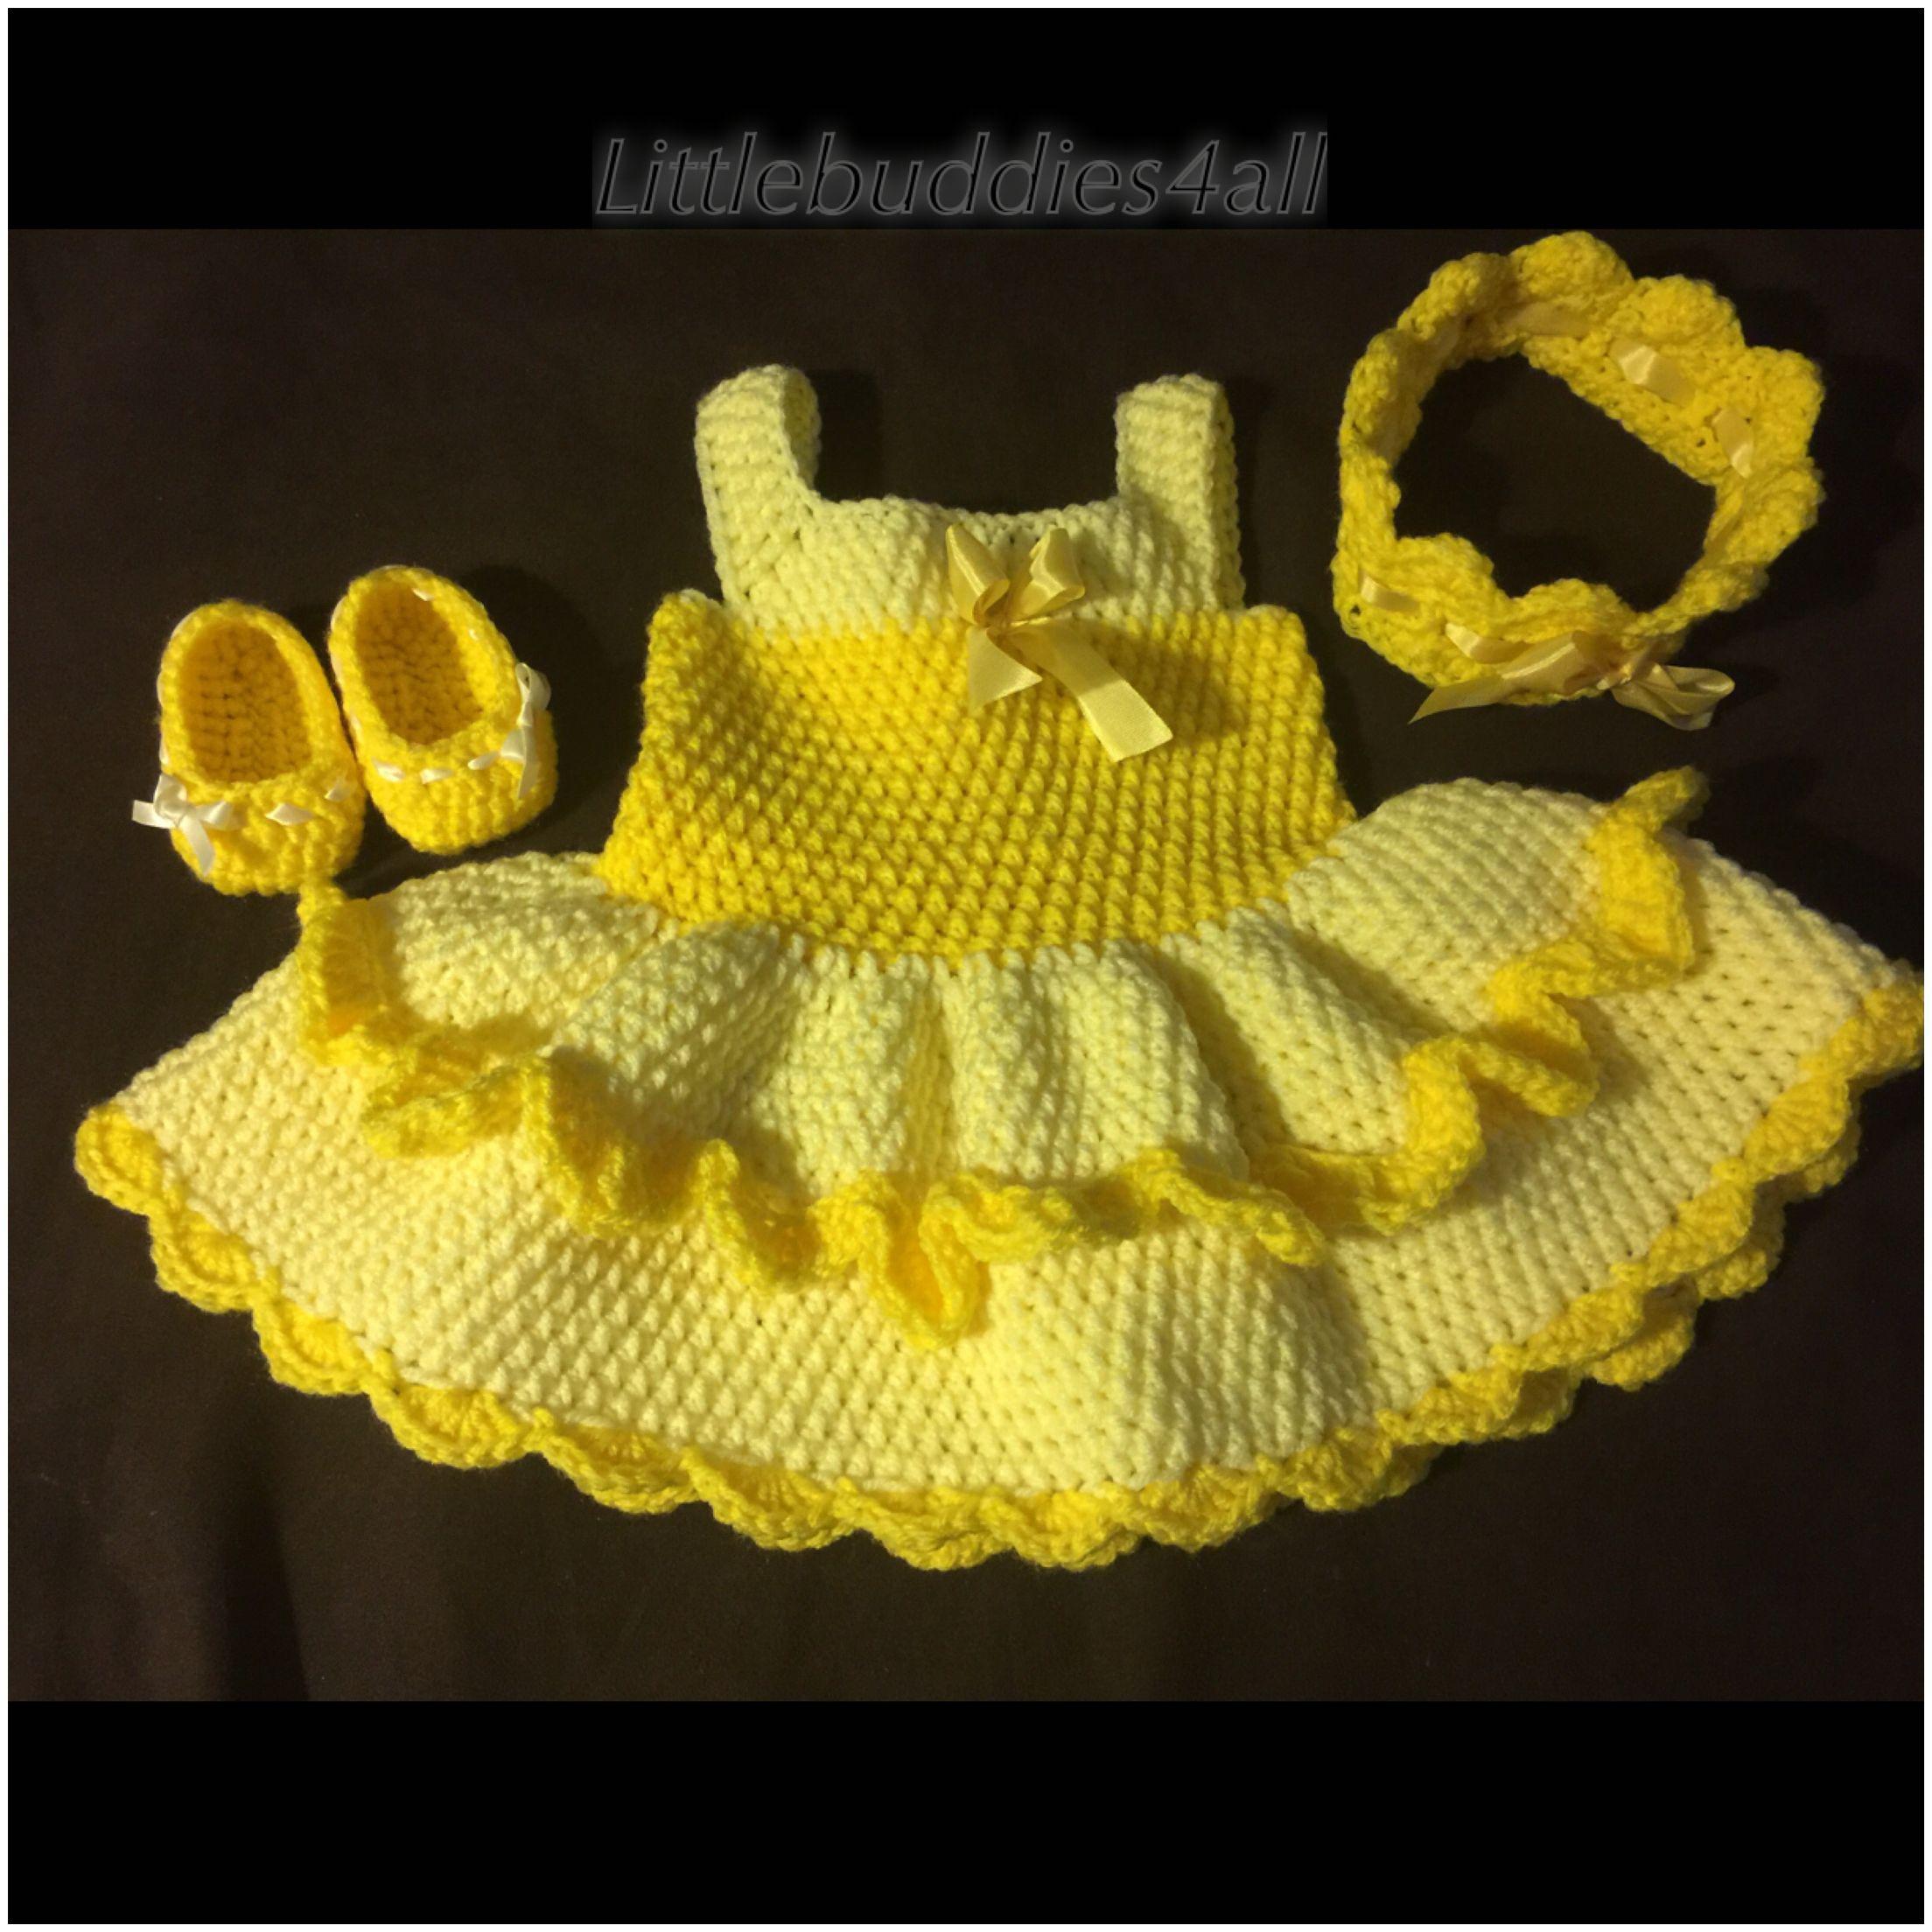 Crochet beauty and the beast inspired dress set